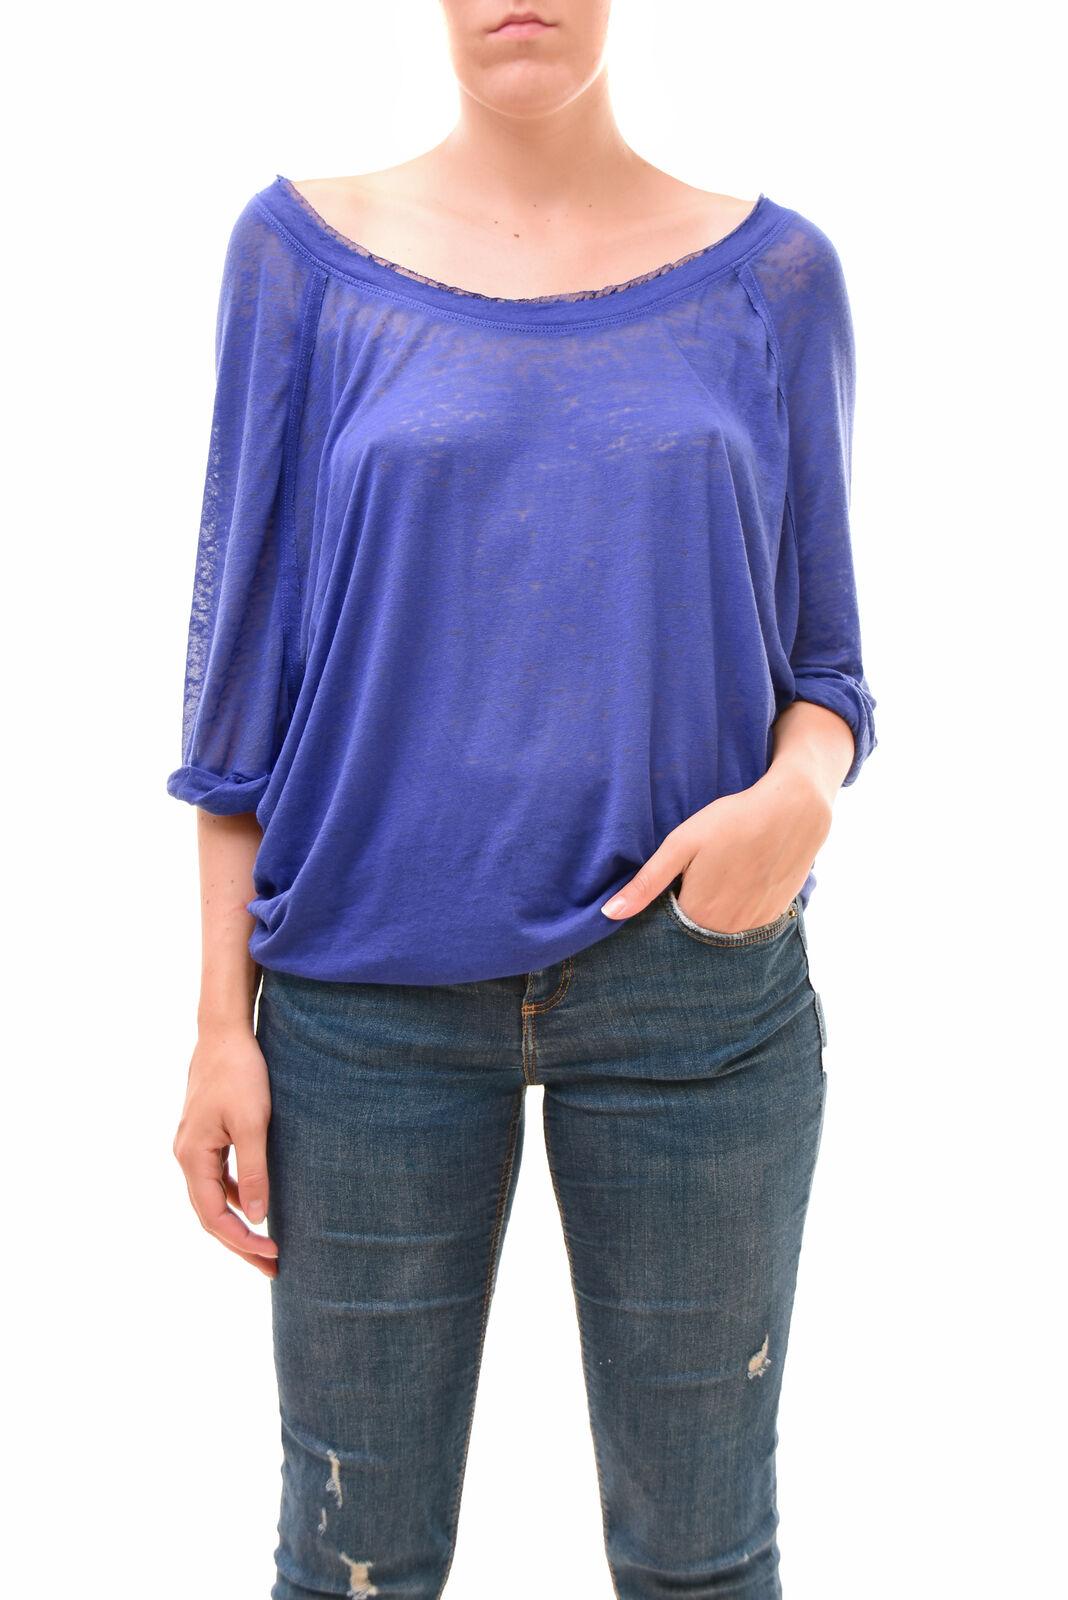 Free People Women's Unique Short Sleeves Moonlight Tee Sky Size XS